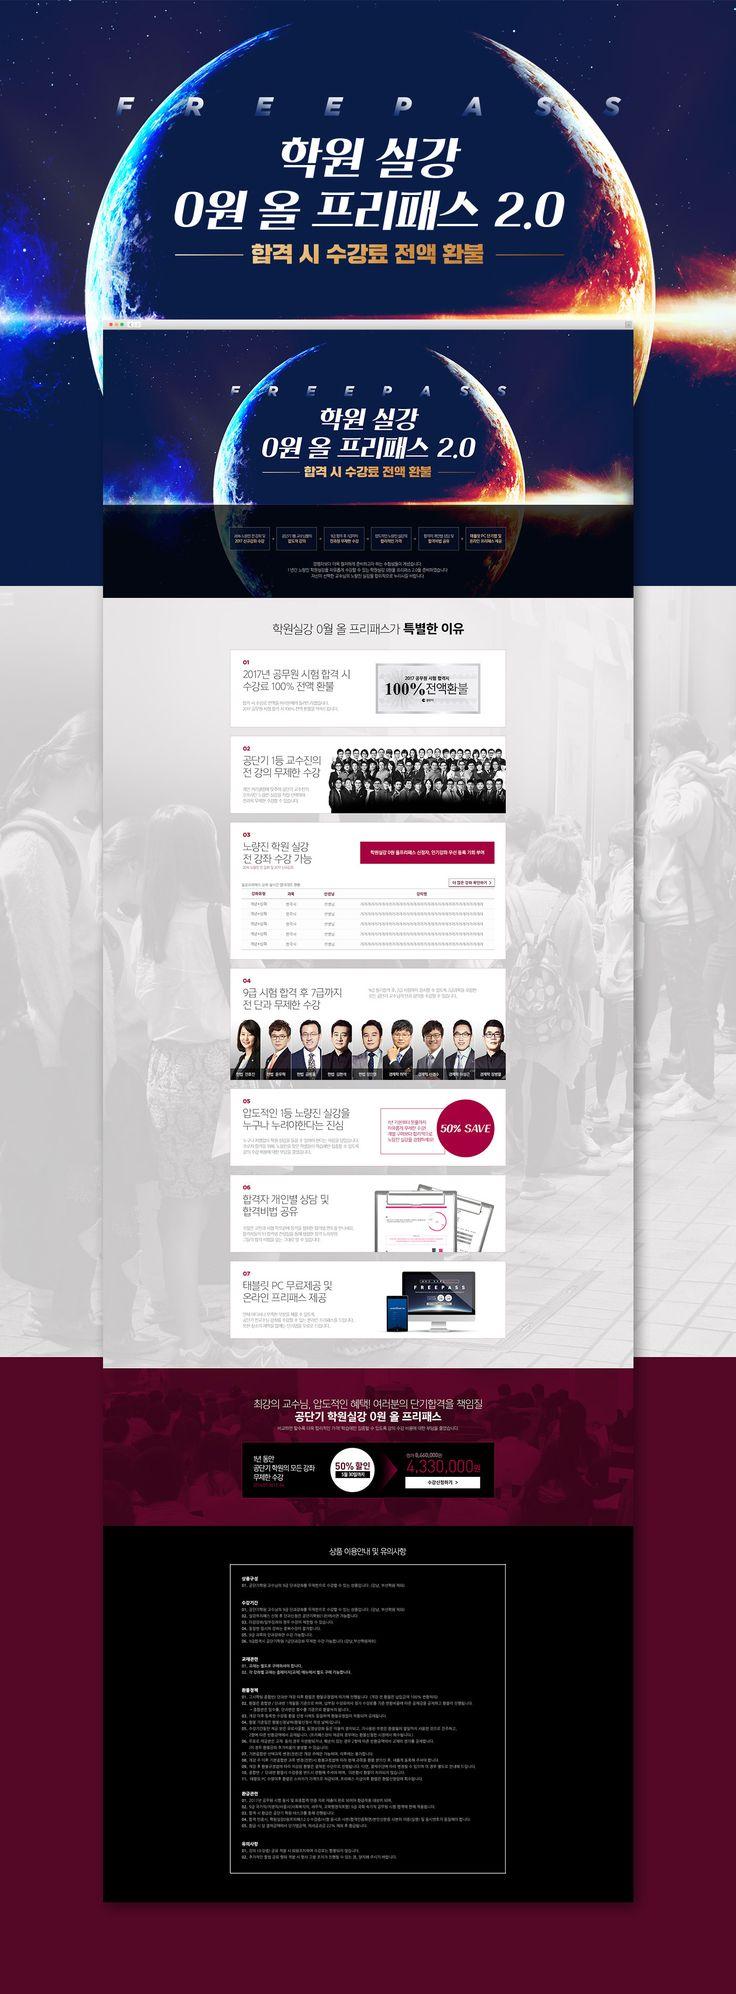 GONGDANGI_학원실강 0원 올프리패스 2.0_16.05.24 on Behance